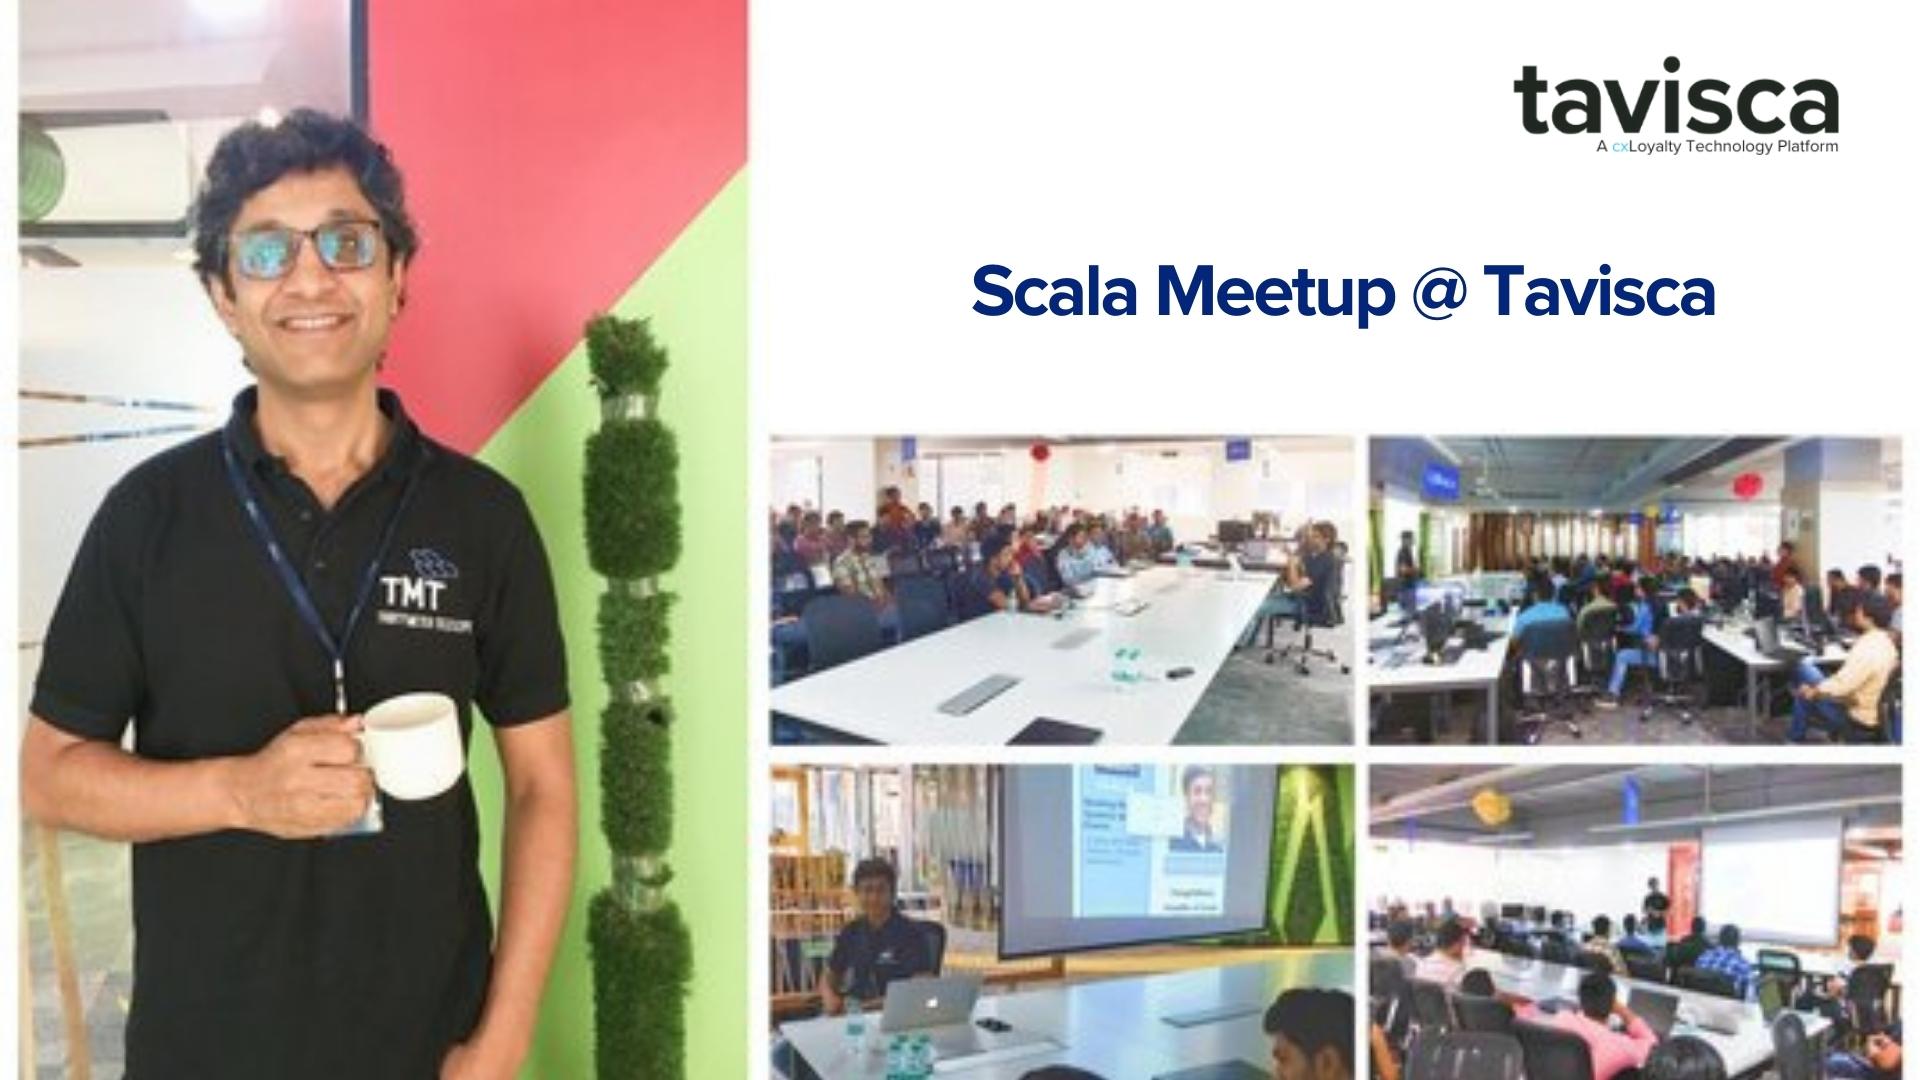 Scala meetup @ tavisca